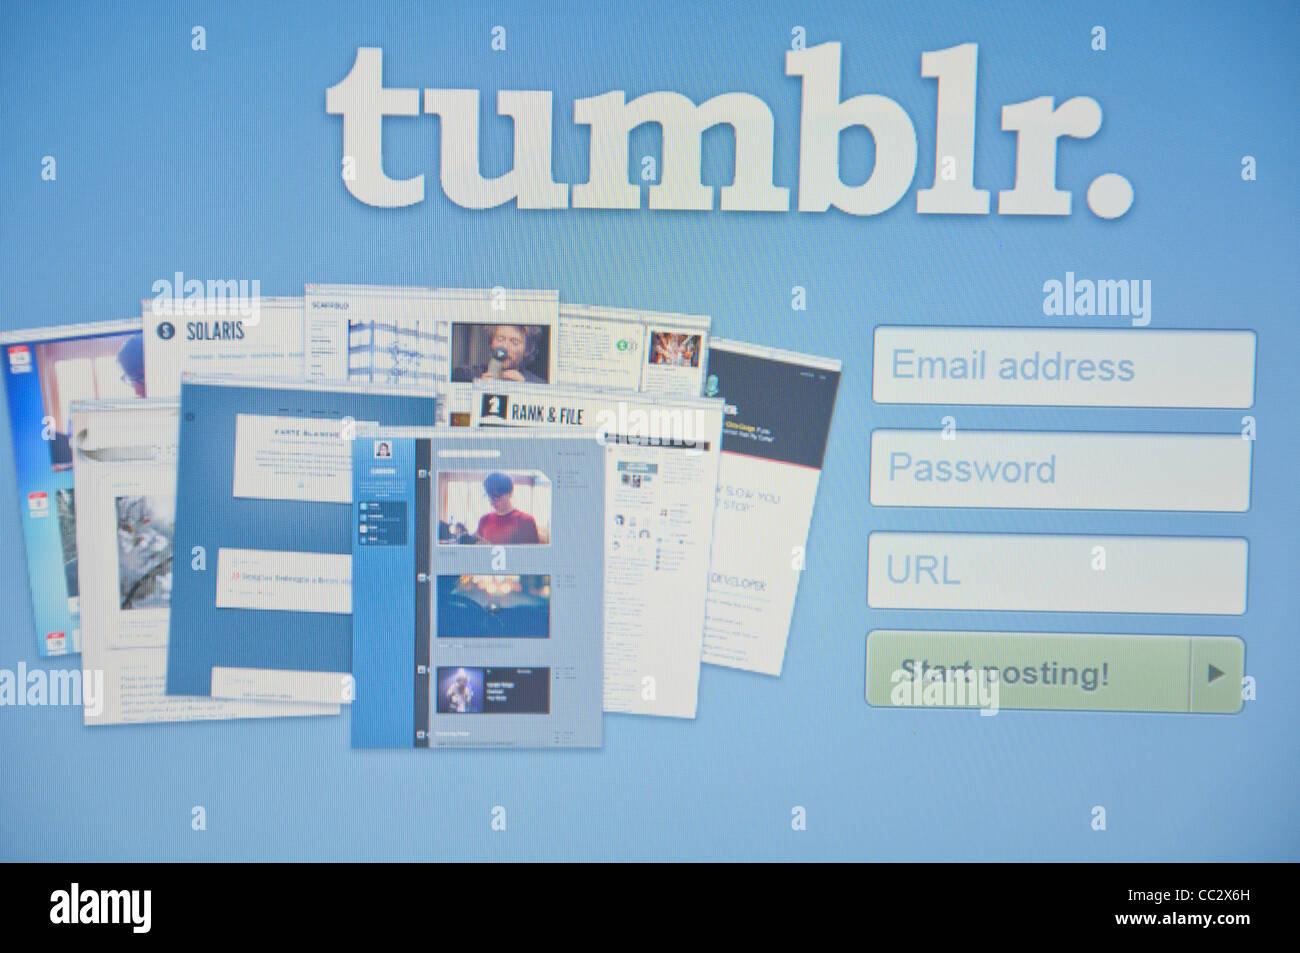 Tumblr website online screenshot screen shot - Stock Image